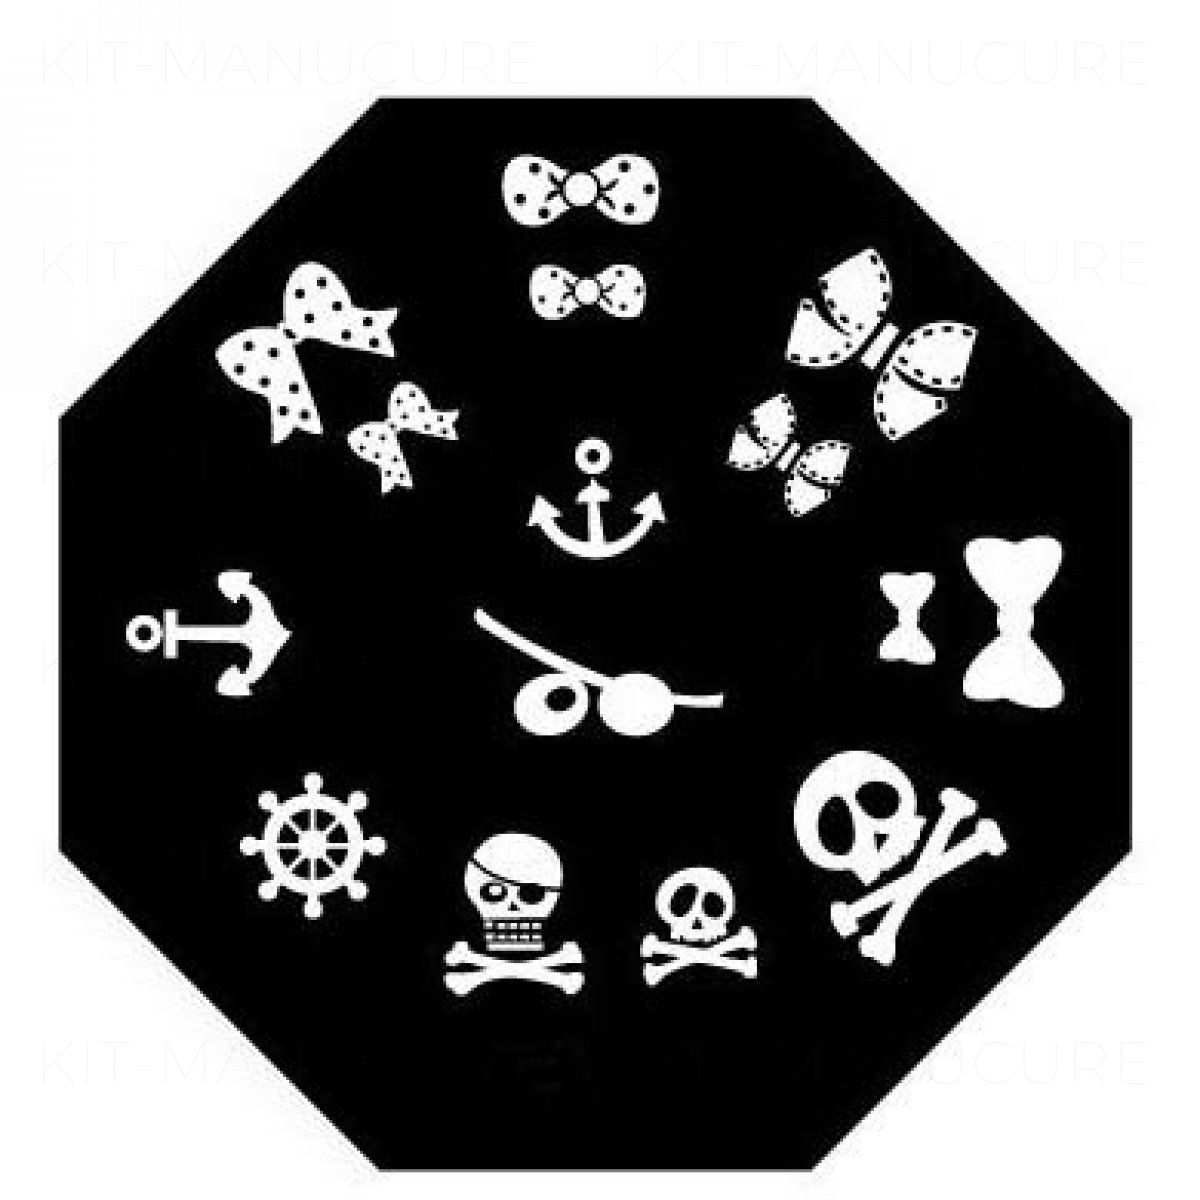 https://www.kit-manucure.com/492-thickbox_default/plaque-de-stamping-tête-de-mort-noeud-ancre-marine.jpg